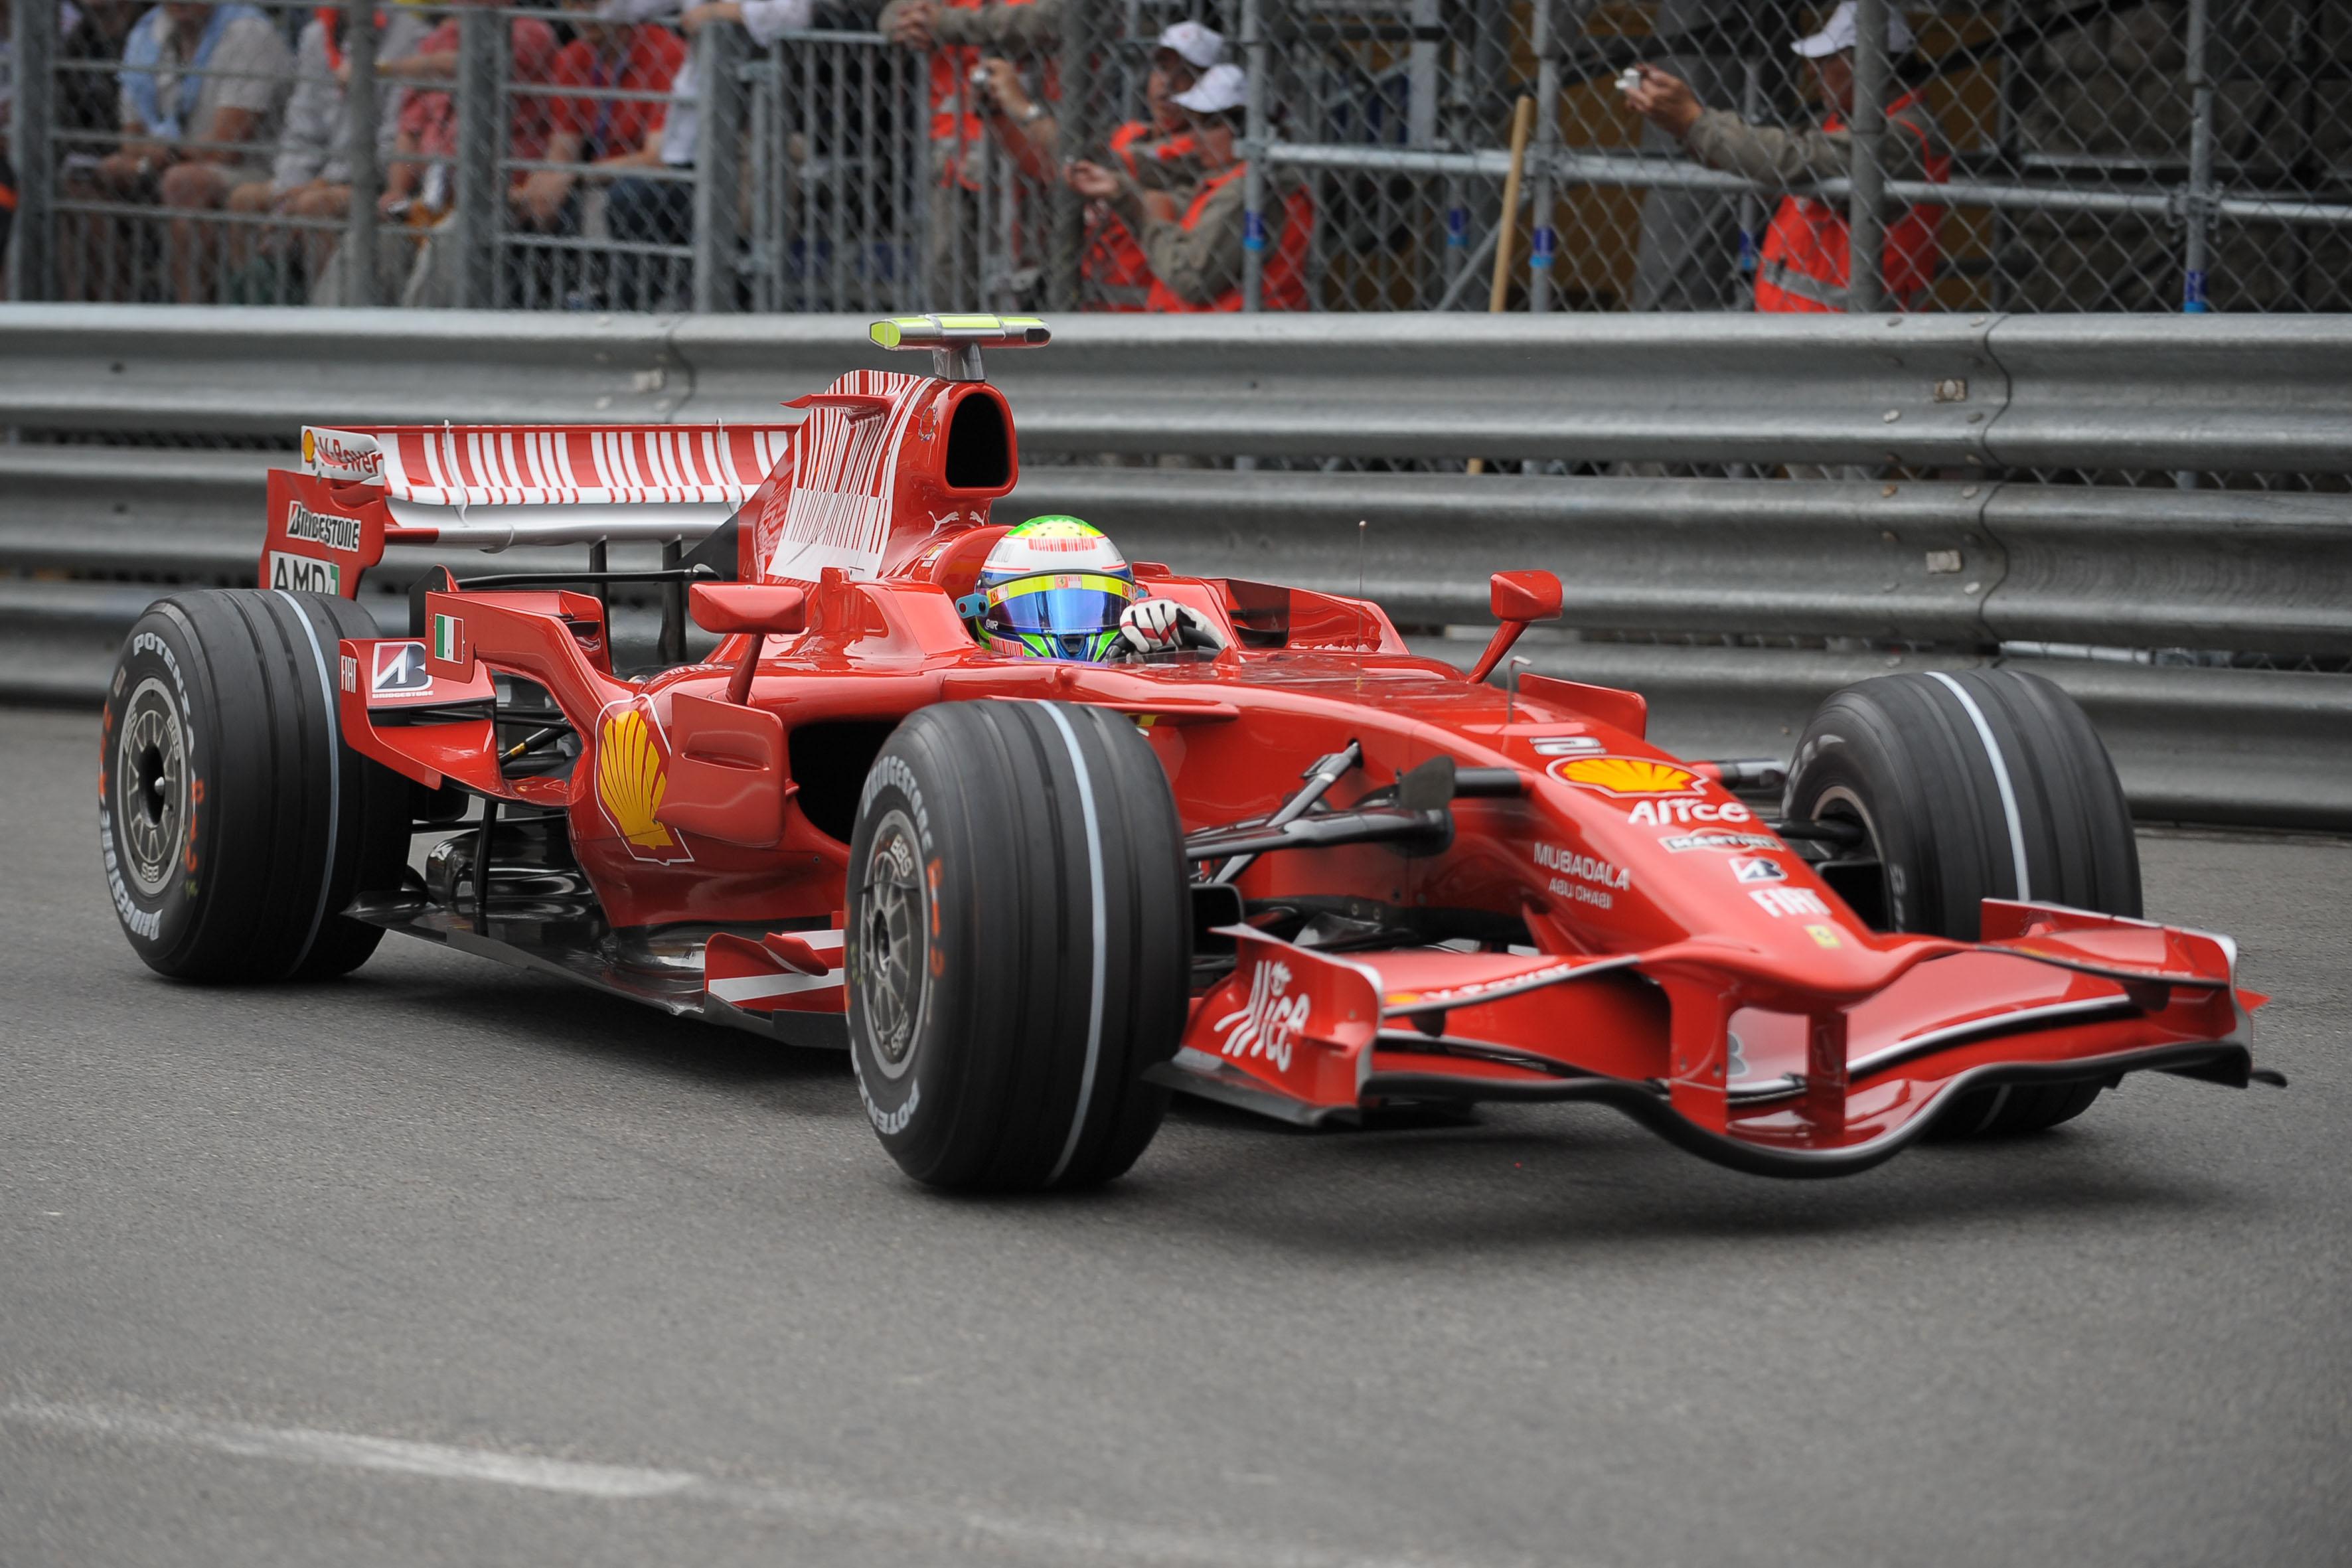 2008 ferrari f1 car